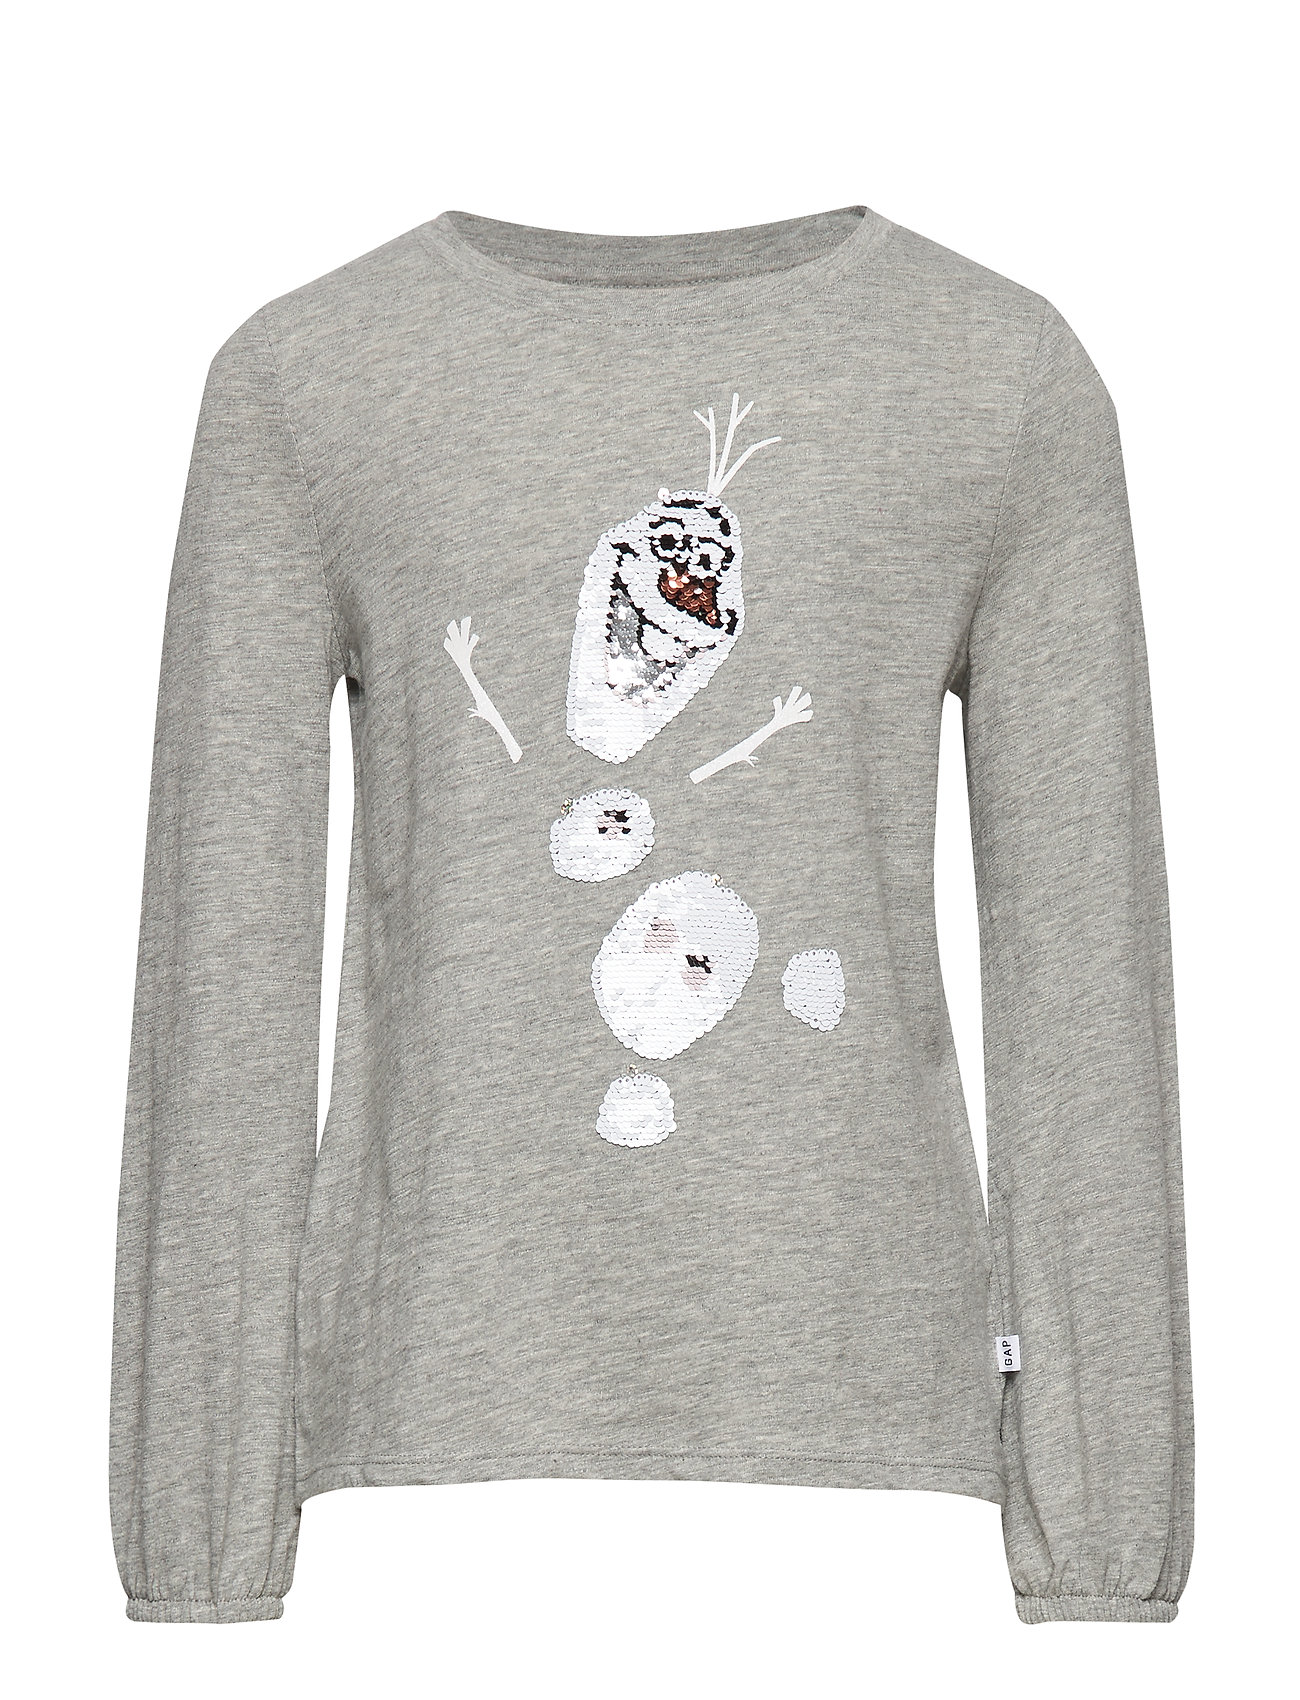 GAP GapKids   Disney Frozen 2 Sequin T-Shirt - B10 GREY HEATHER